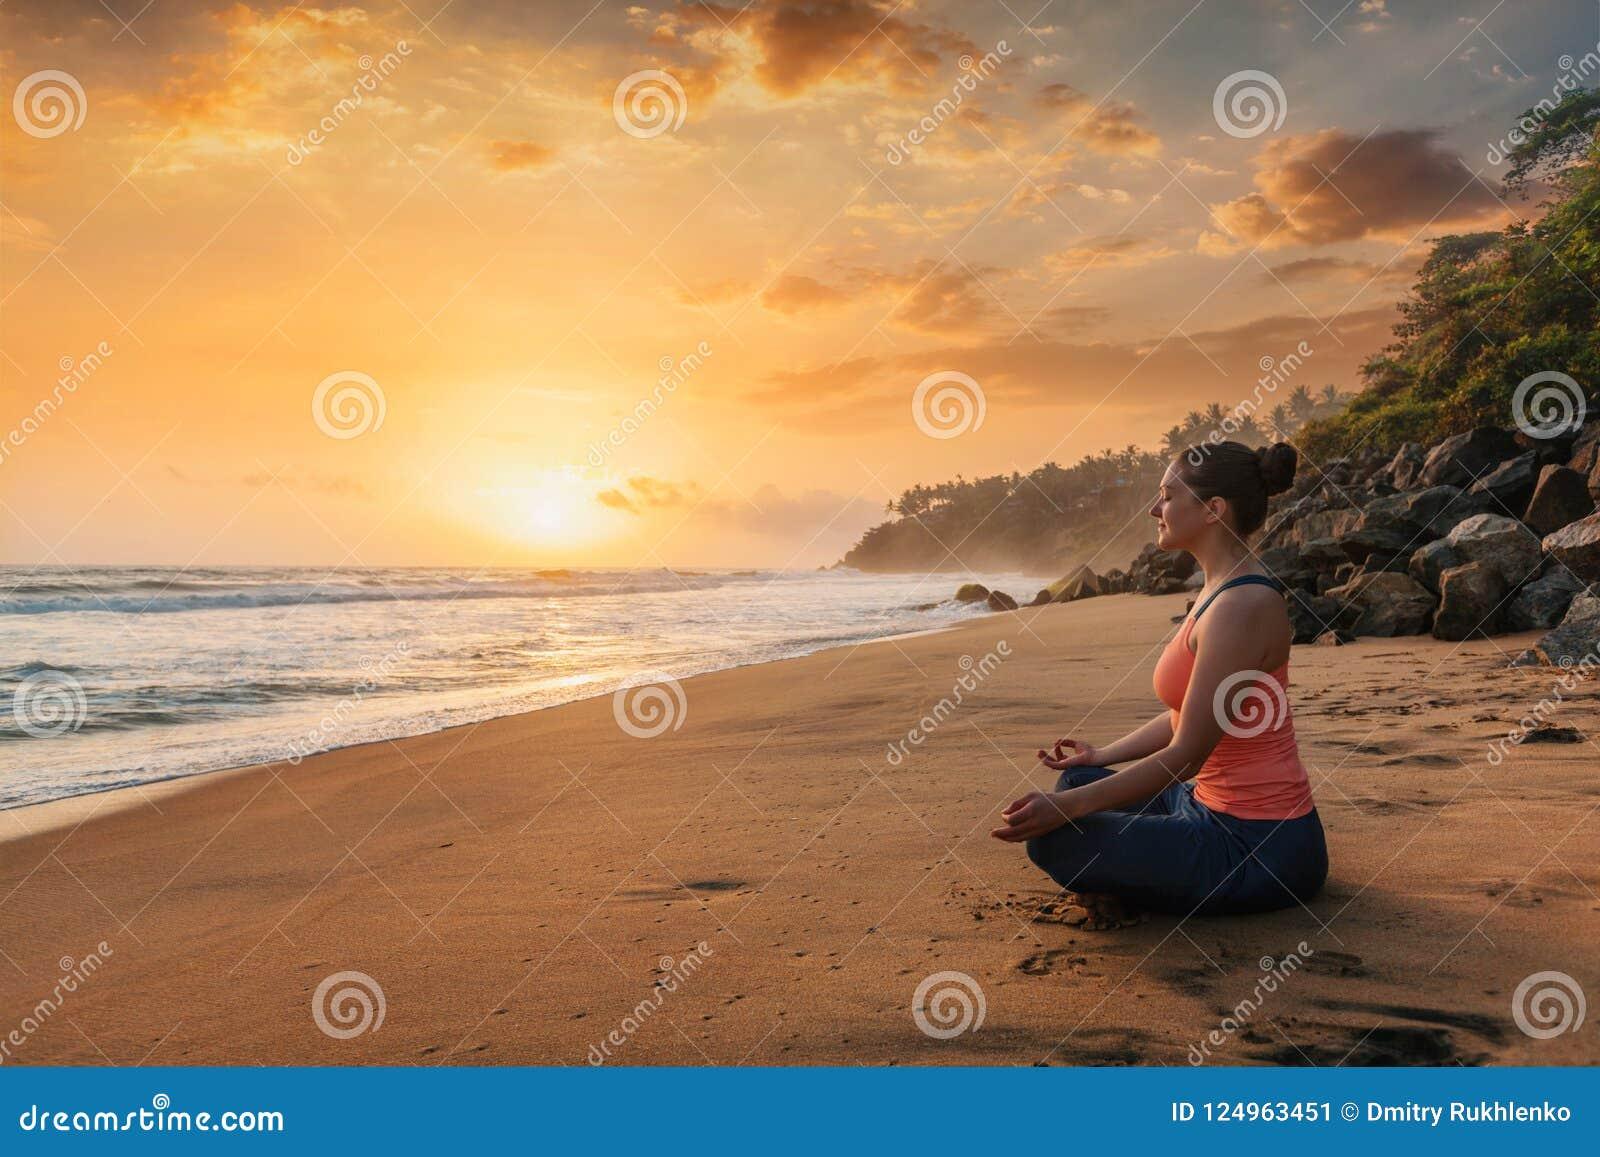 Woman doing yoga at beach - Padmasana lotus pose